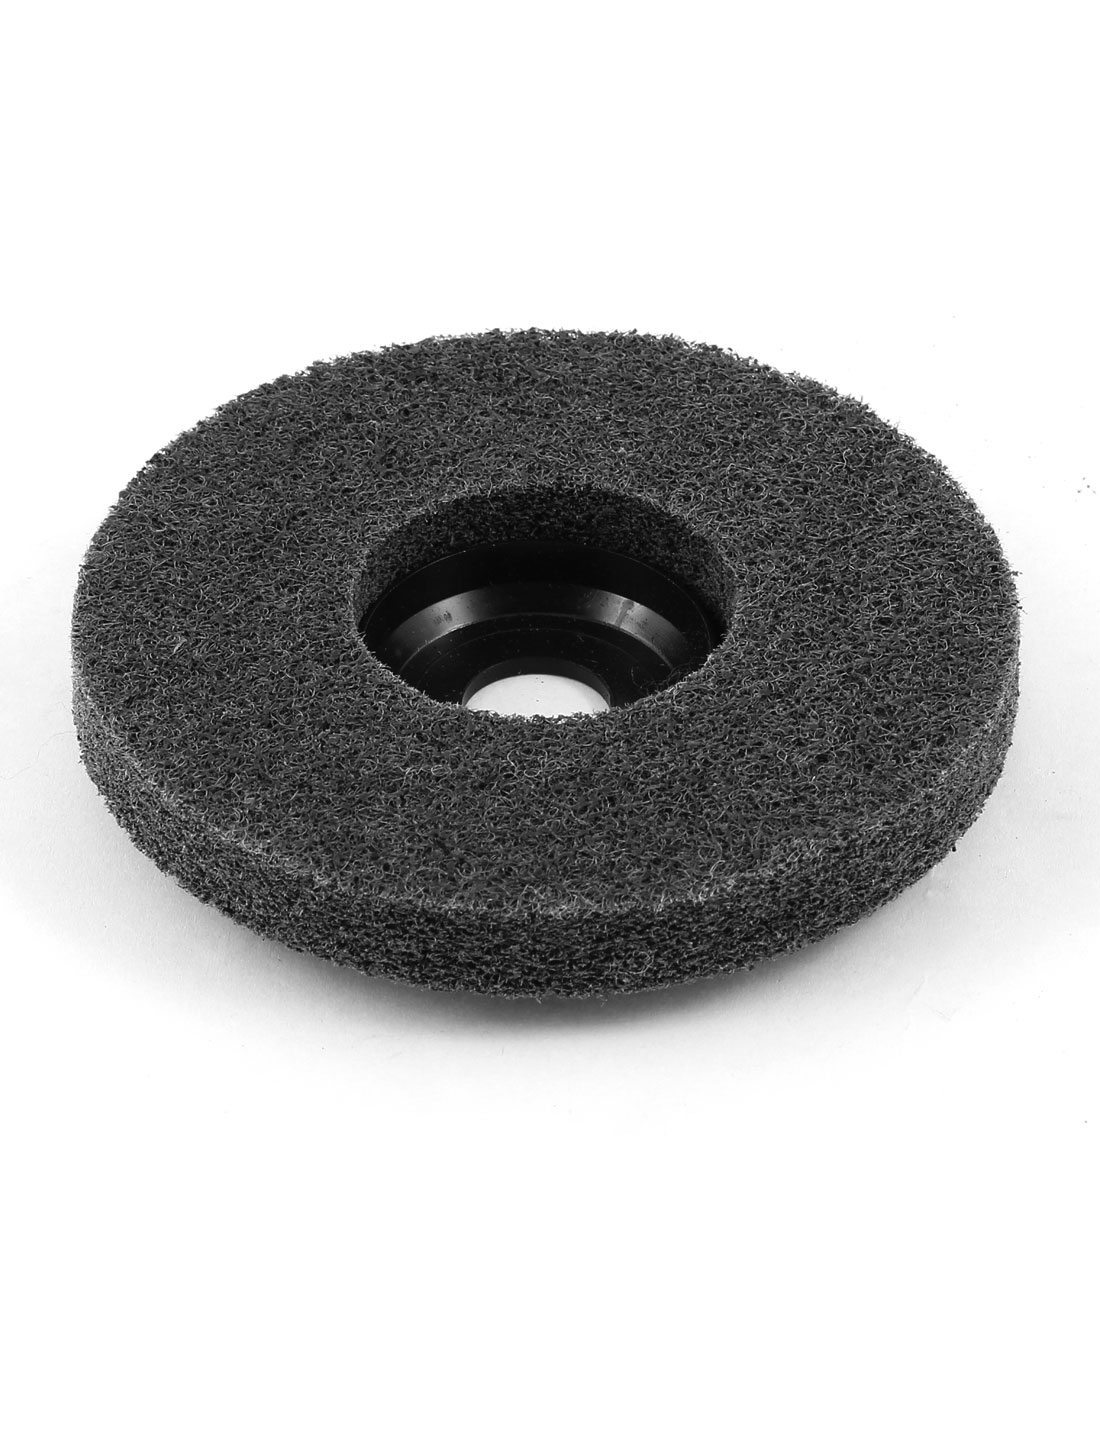 100mm Diameter Nylon Polishing Grinding Pad Wheel for Concrete Marble Granite